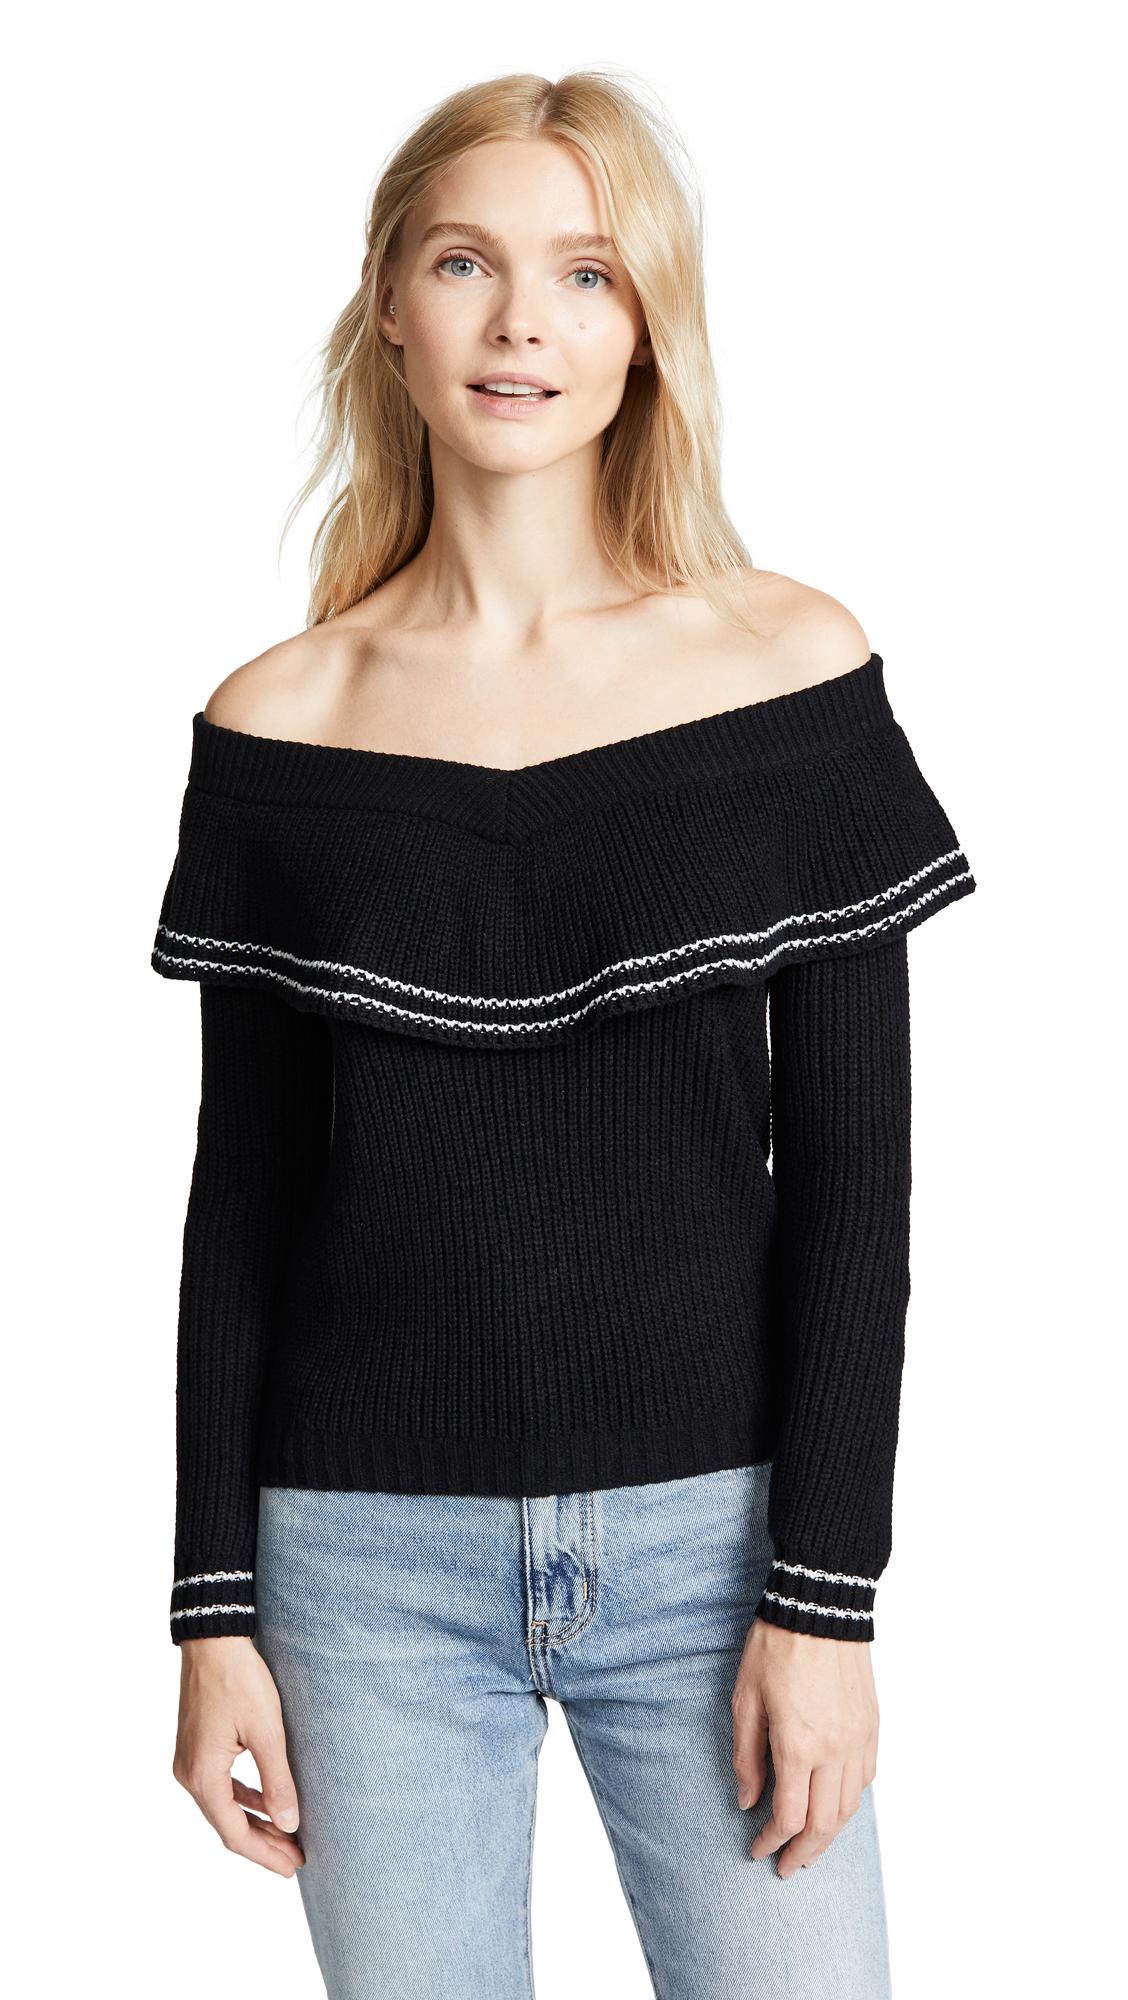 BB Dakota Rush Week Off Shoulder Ruffle Sweater - Black